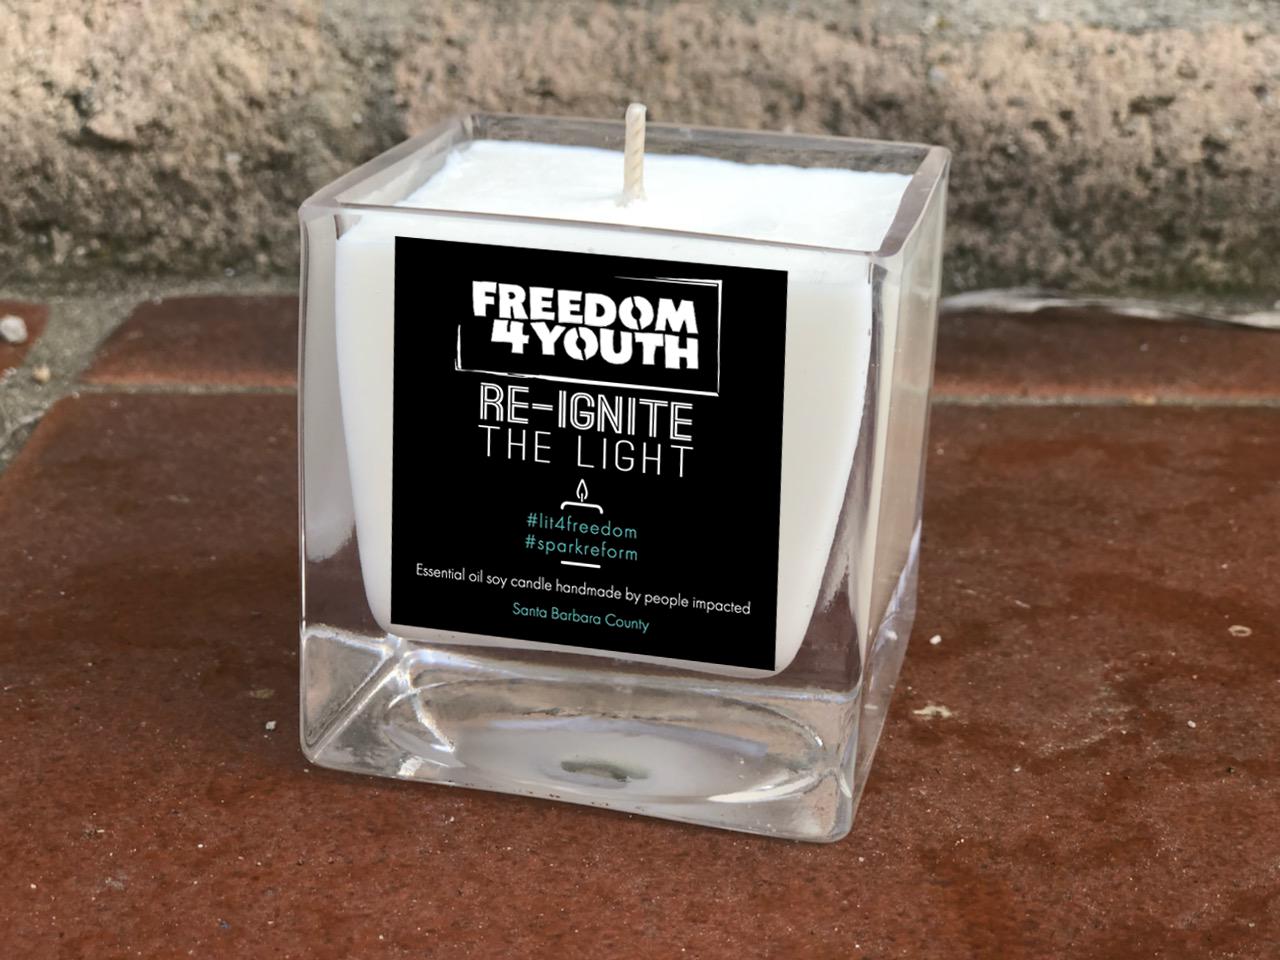 F4Y Lit 4 Freedom Essential Oil Soy Candle